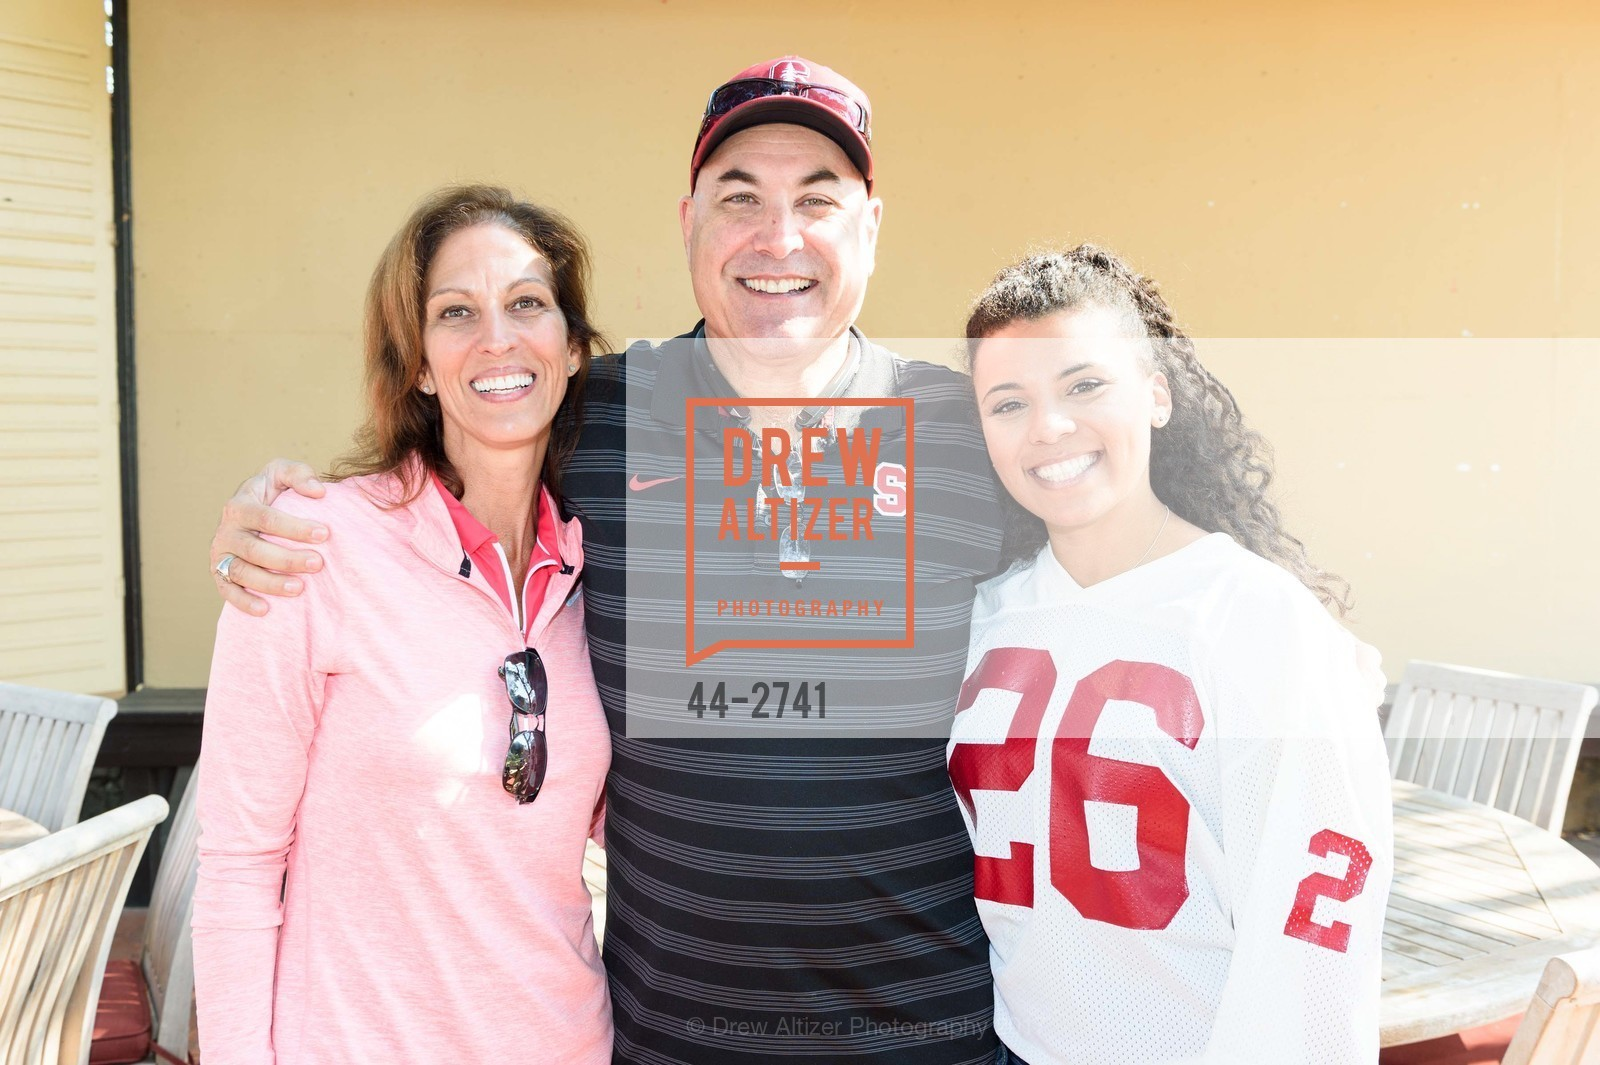 Jackie Zubler, Mike Dotterer, Aubrey Tolliver, Photo #44-2741